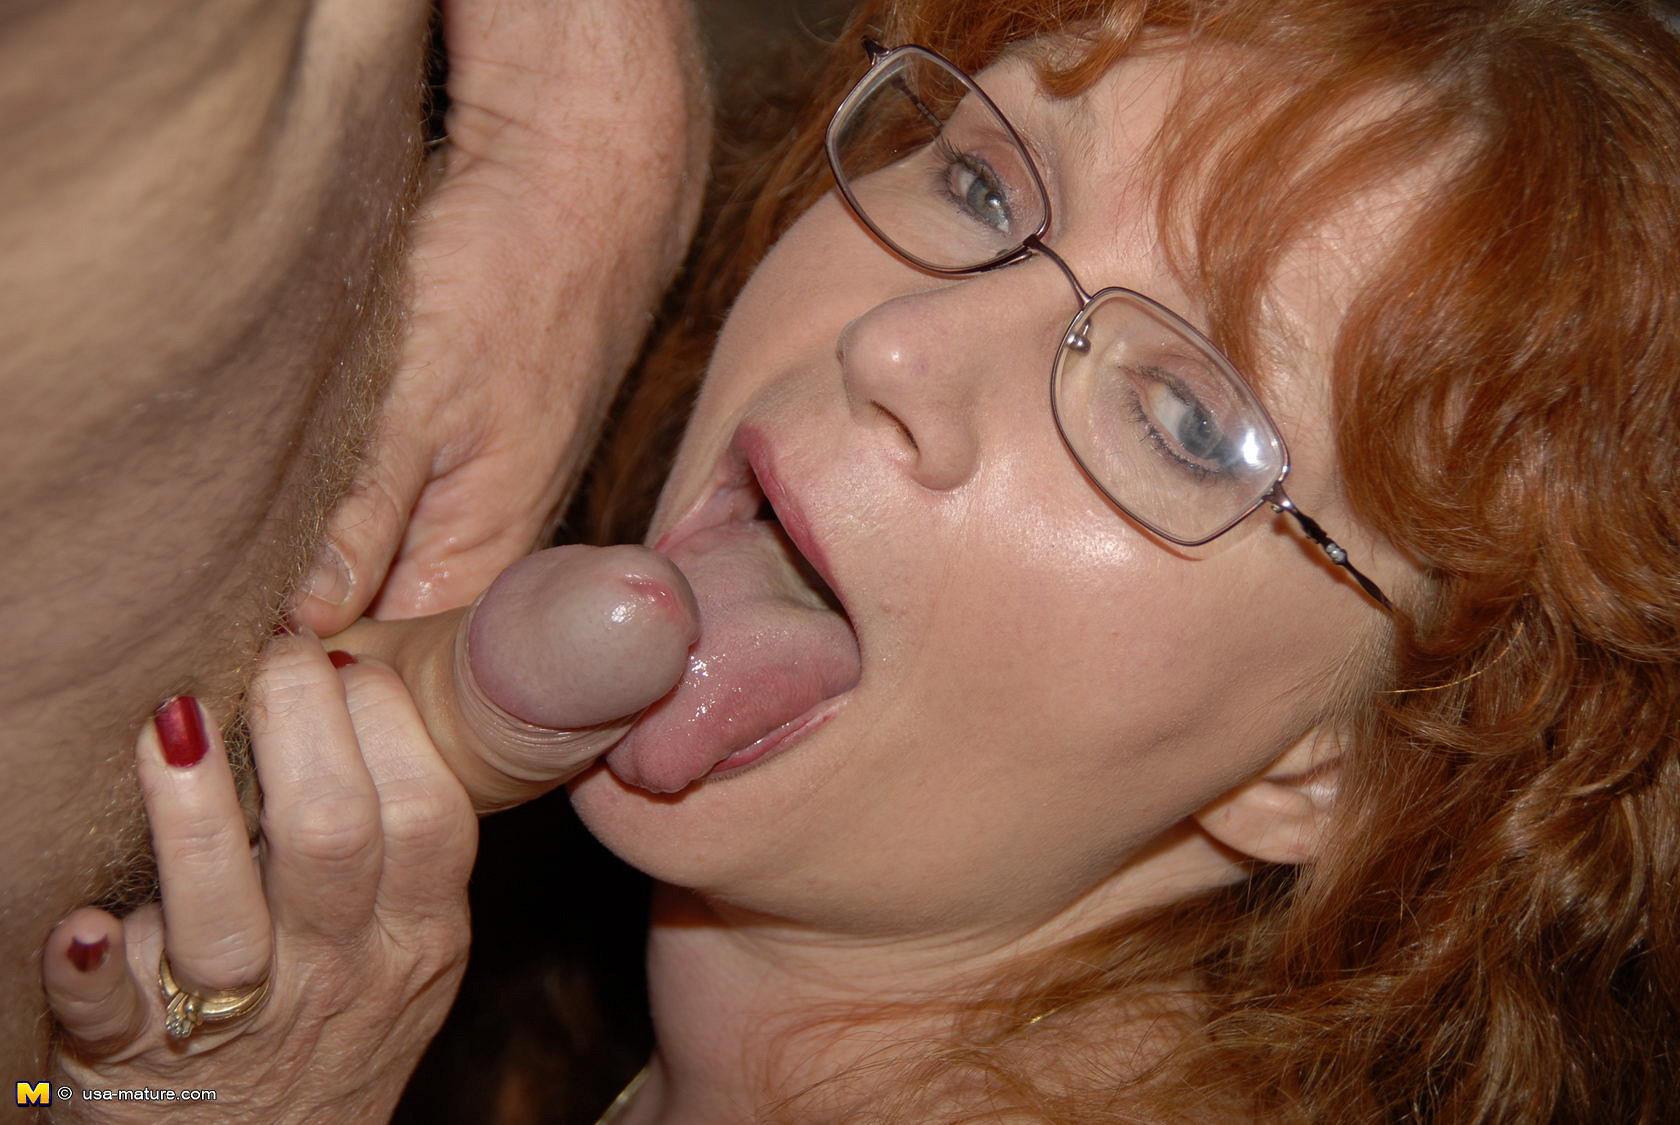 Porn star kelly stafford pics